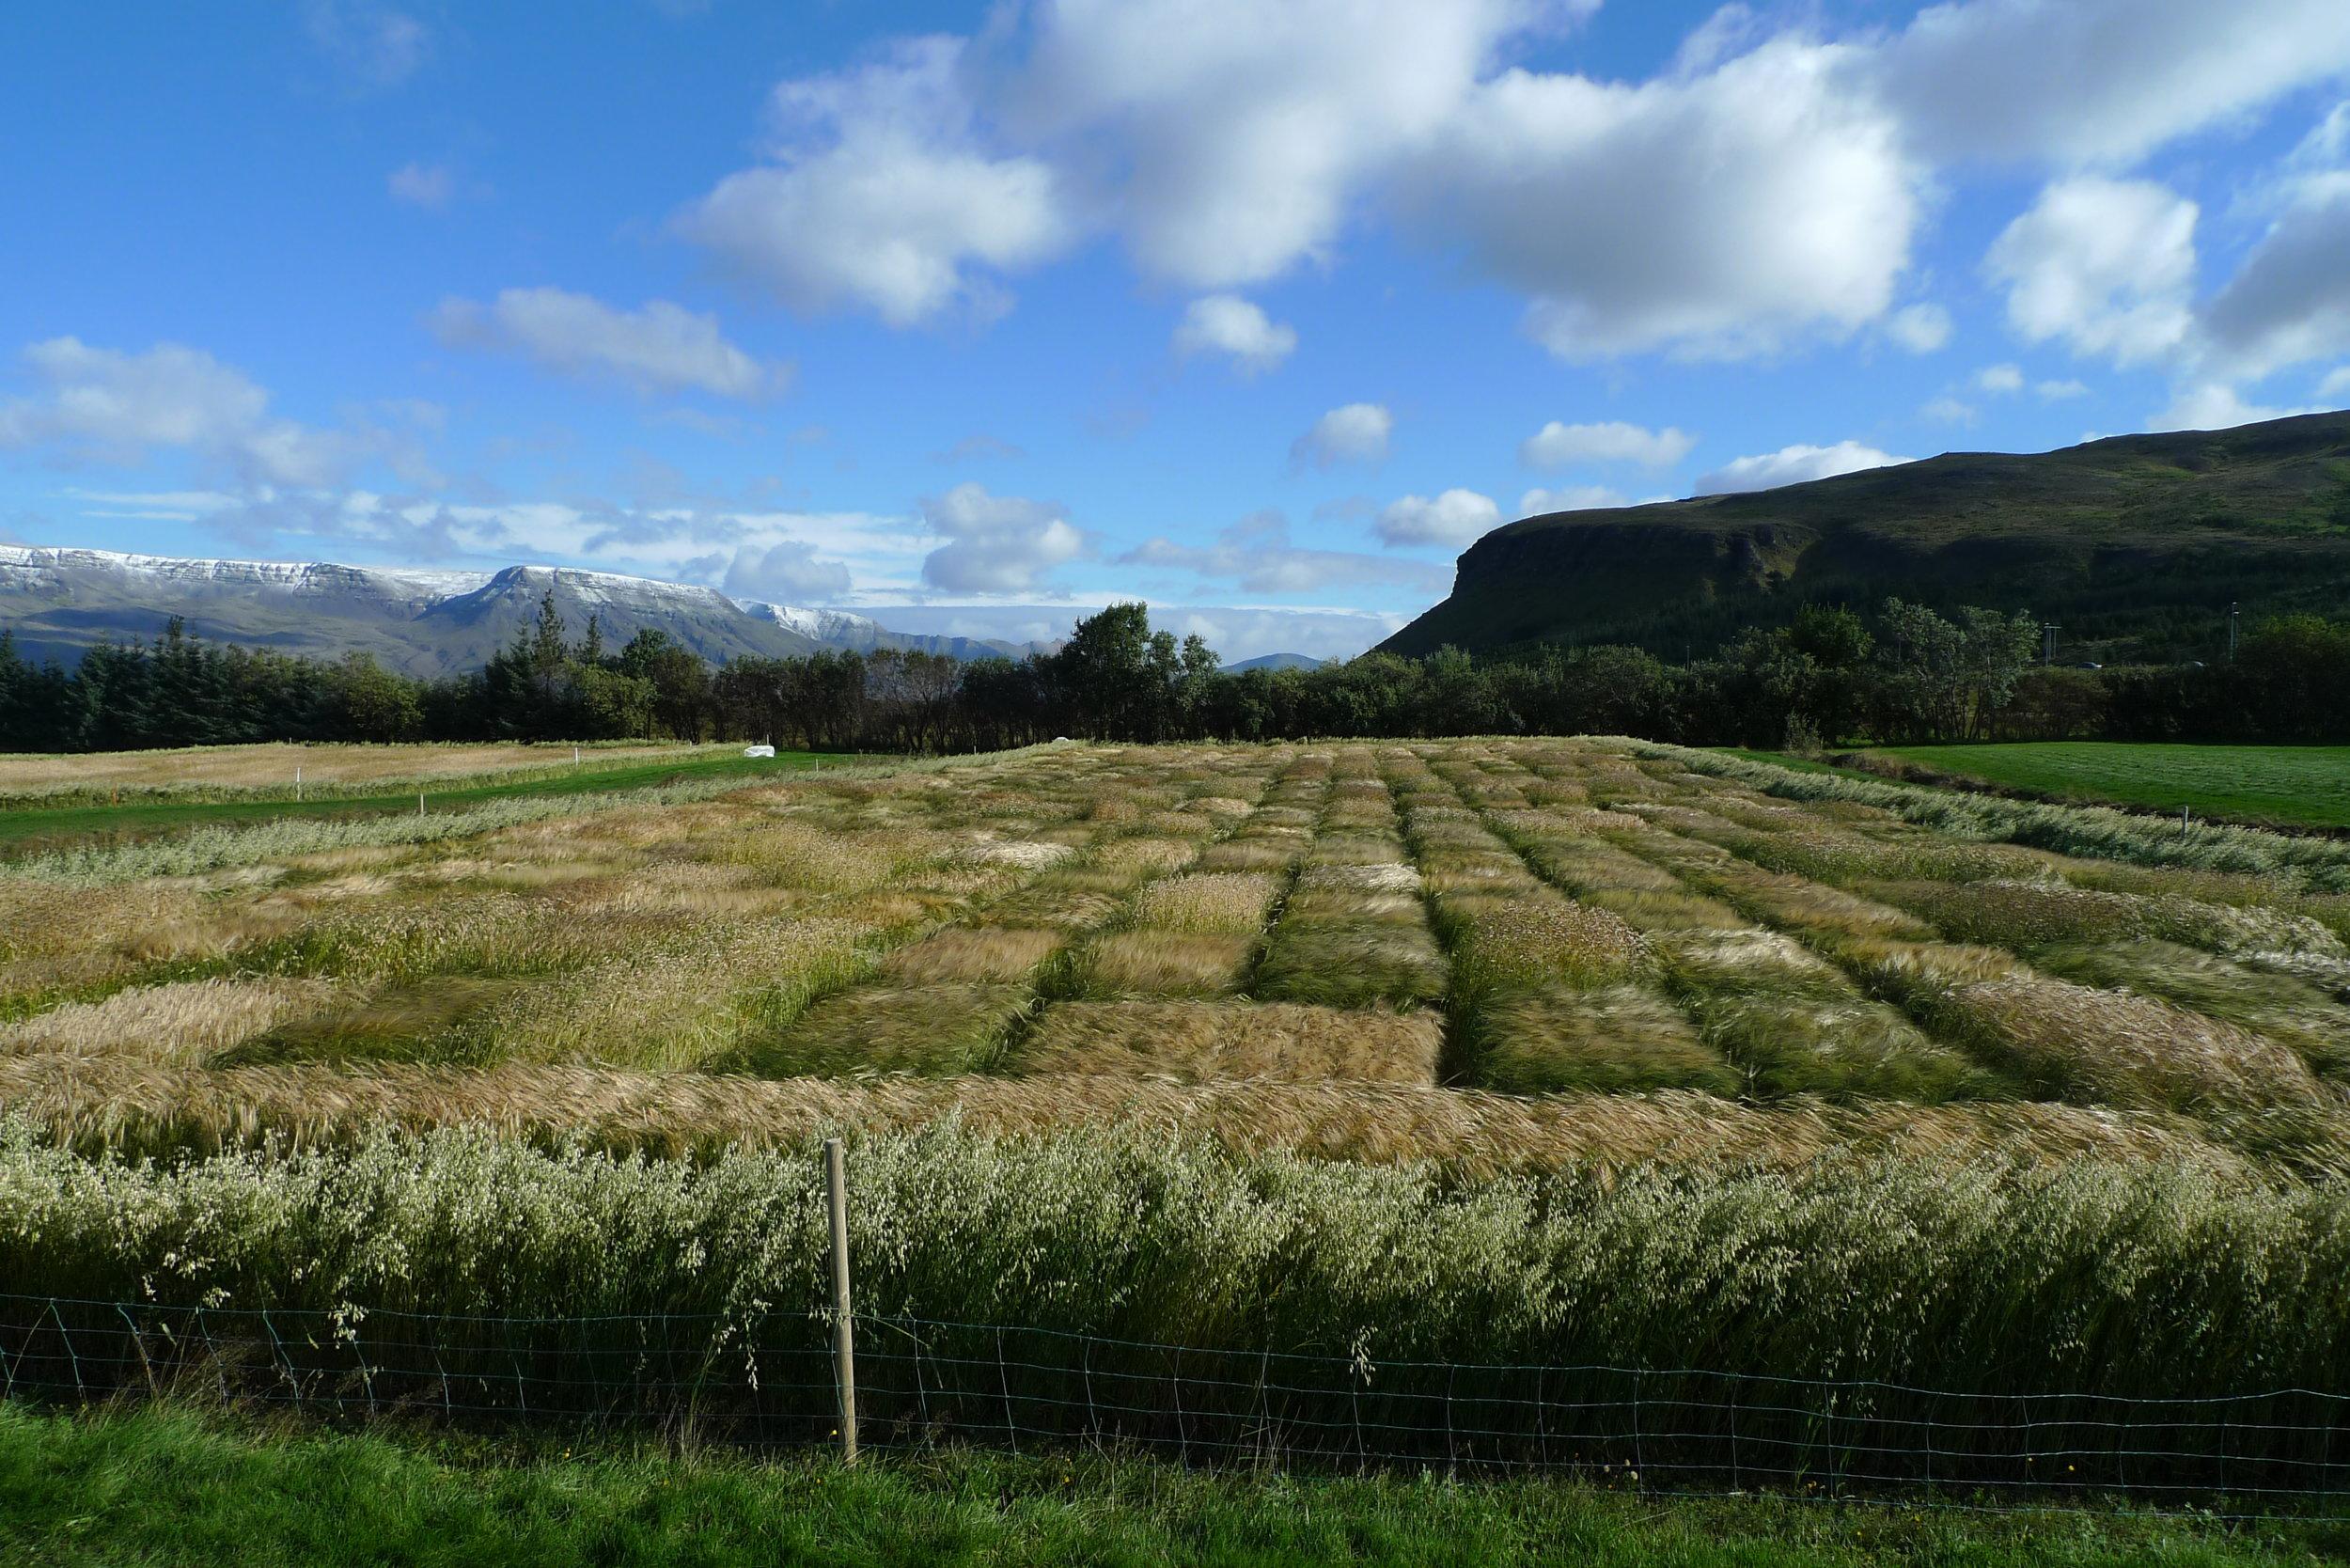 PPP barley field trial Iceland September 2012 MG.JPG